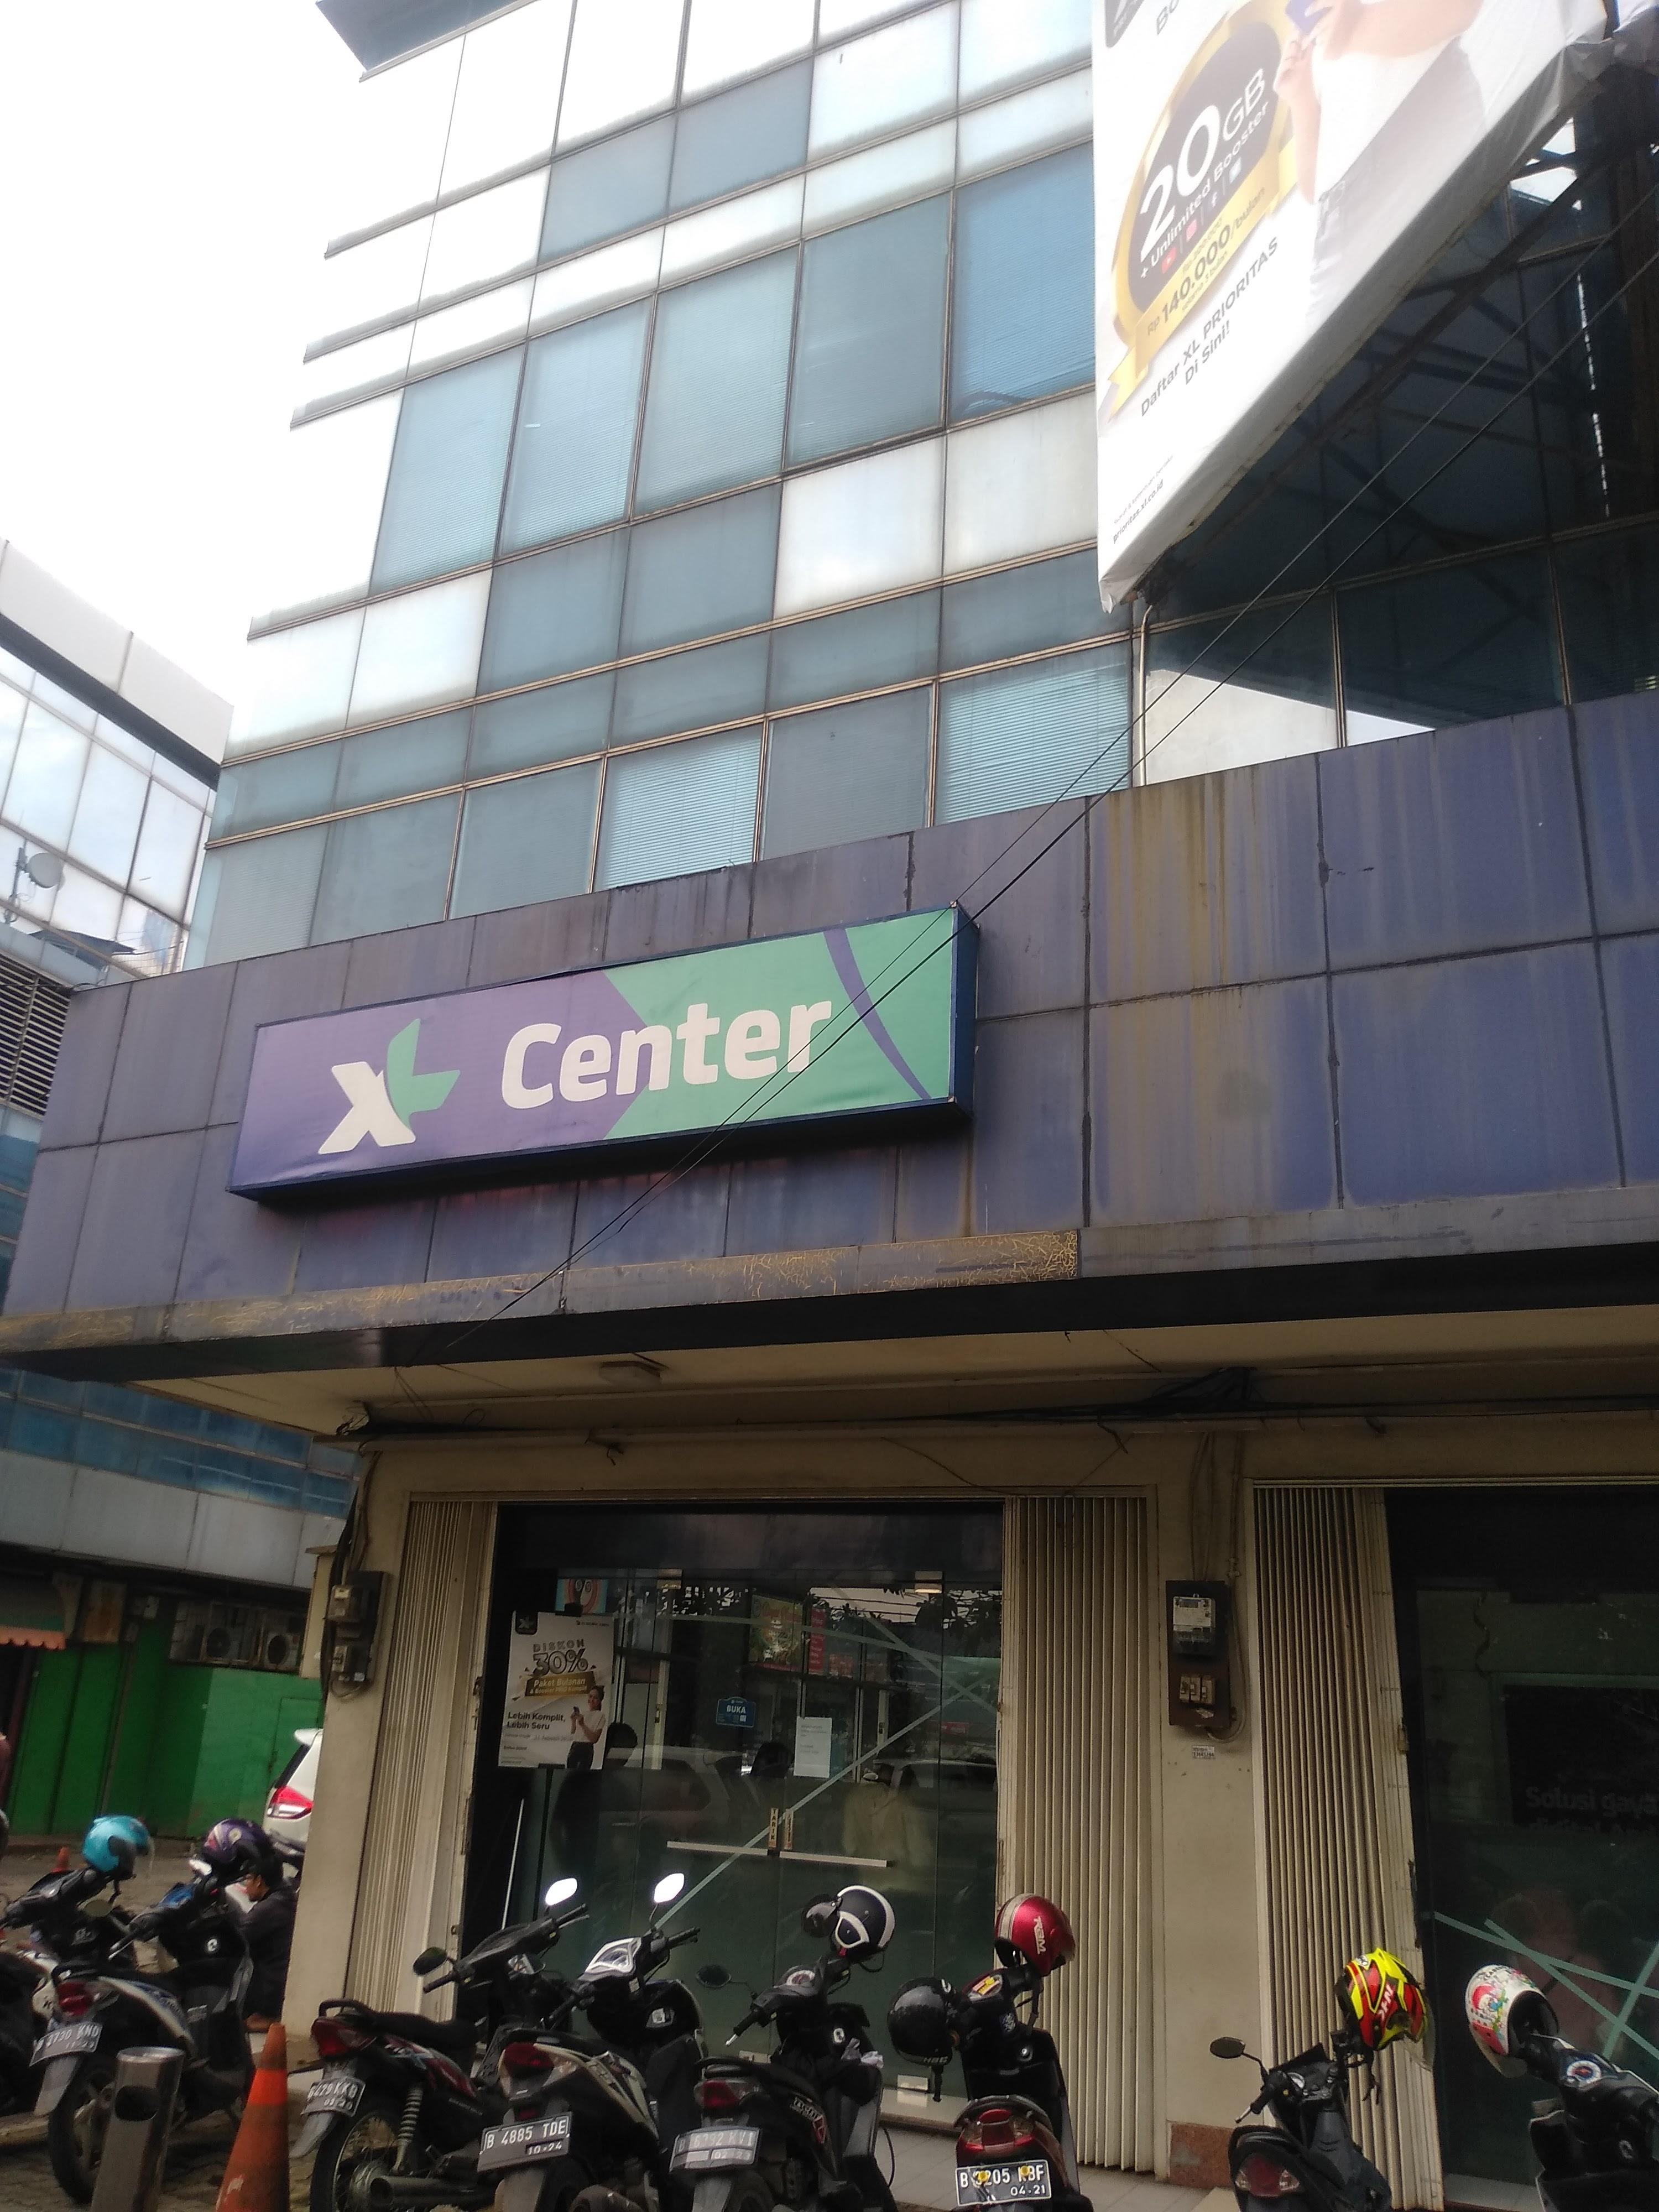 XL Center Bekasi